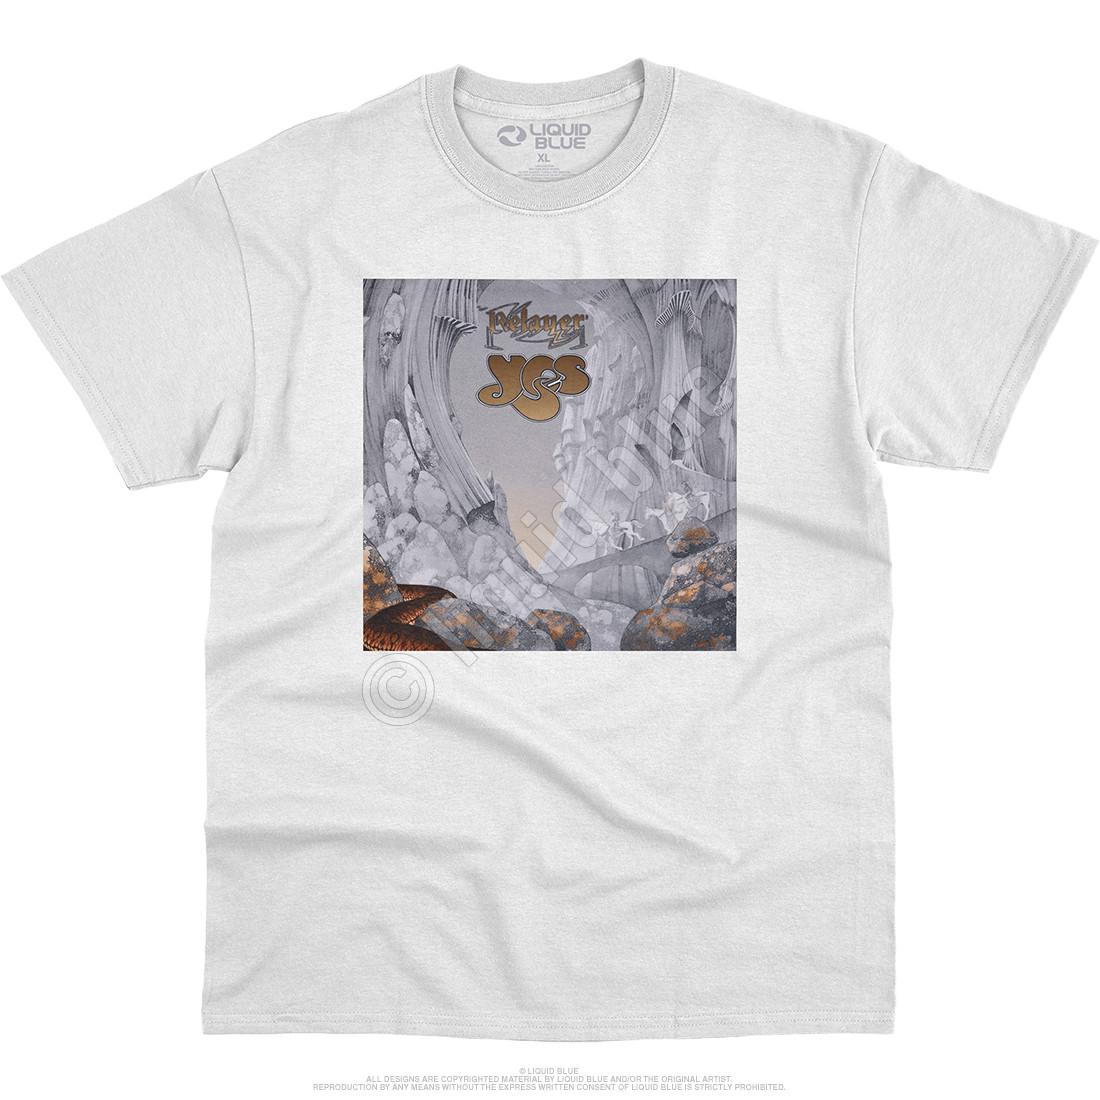 Relayer White T-Shirt